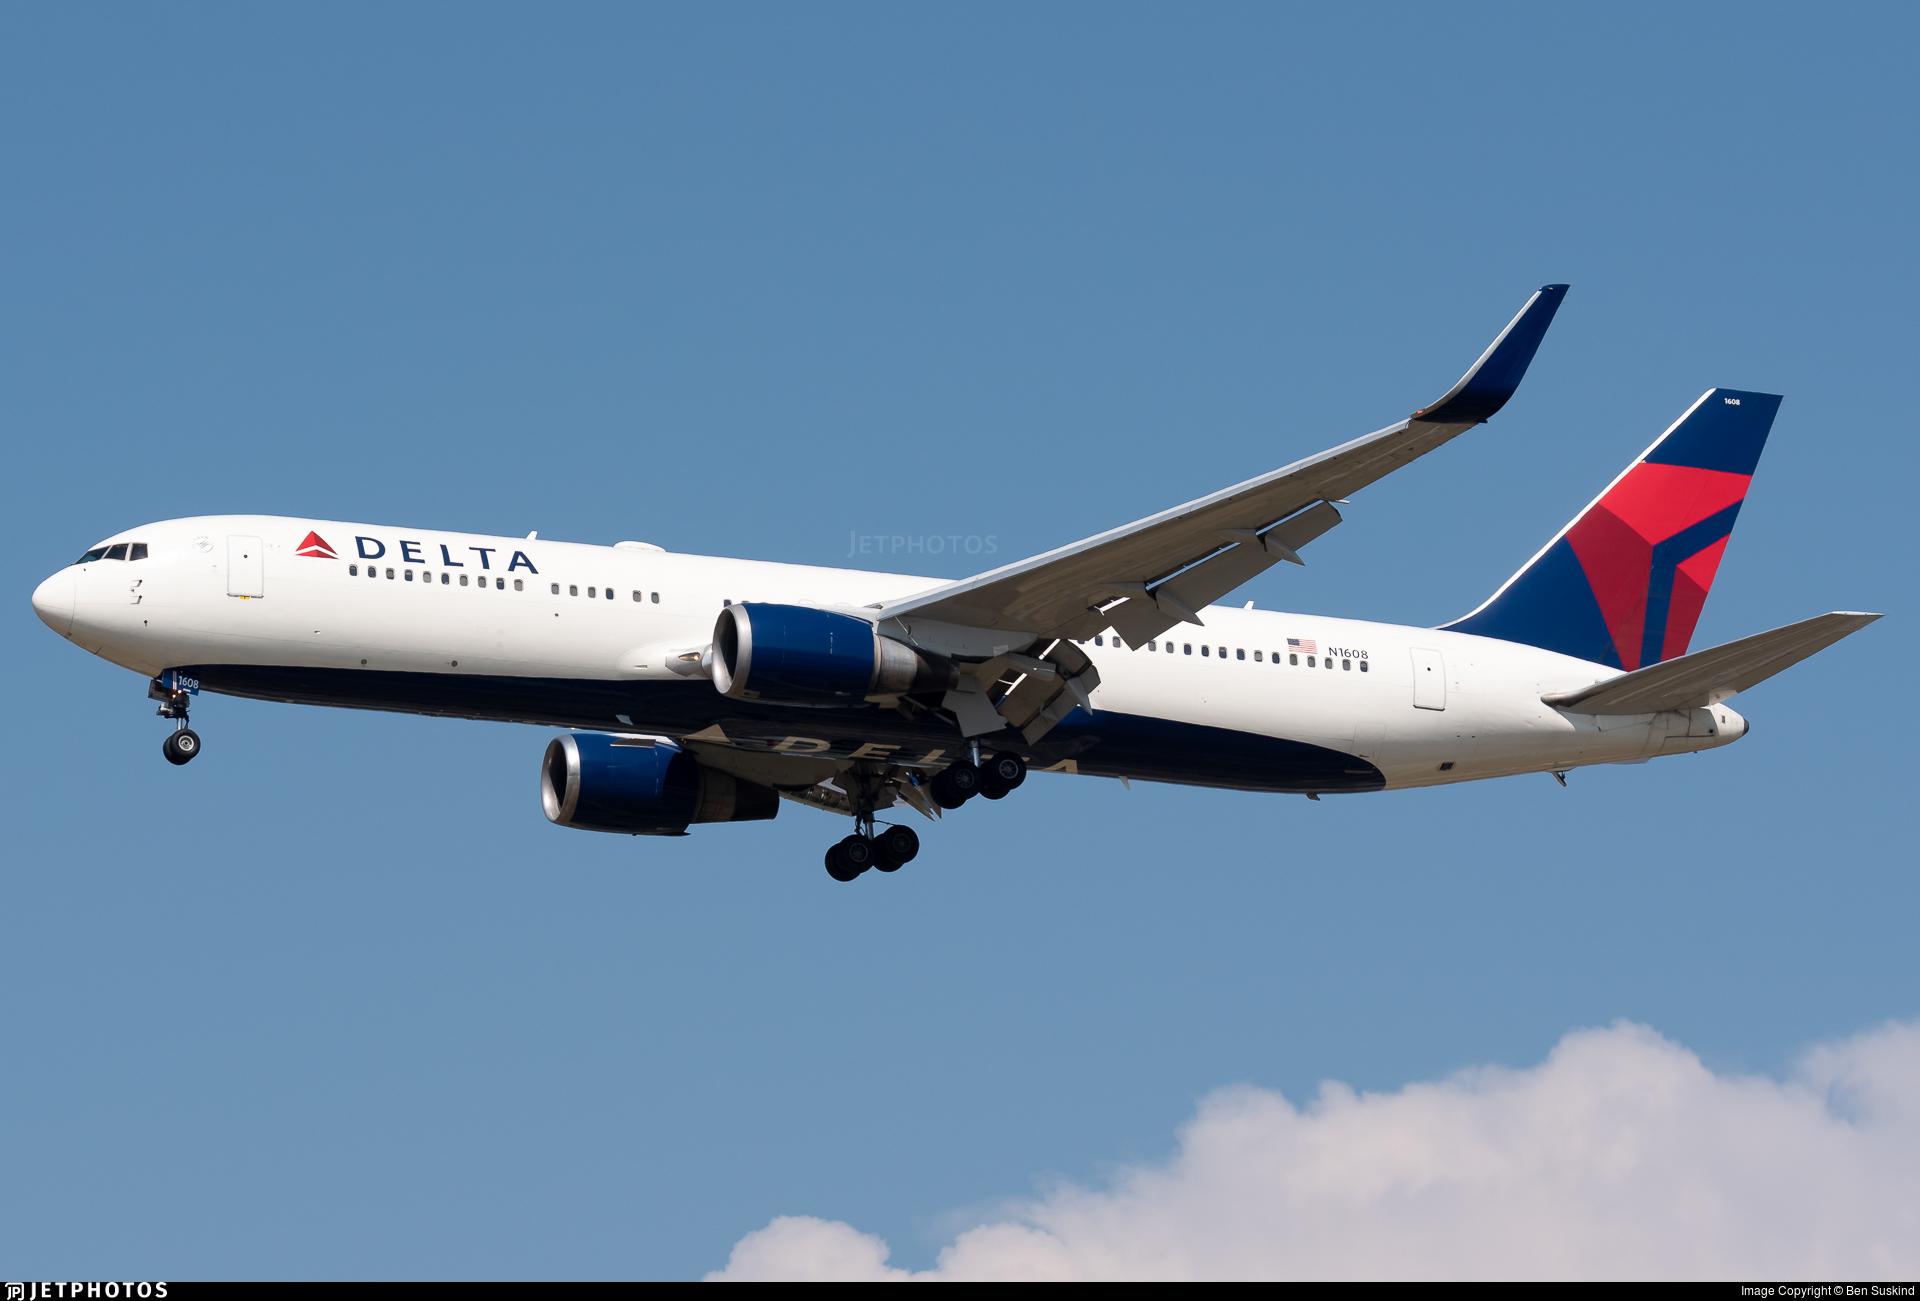 N1608 - Boeing 767-332(ER) - Delta Air Lines